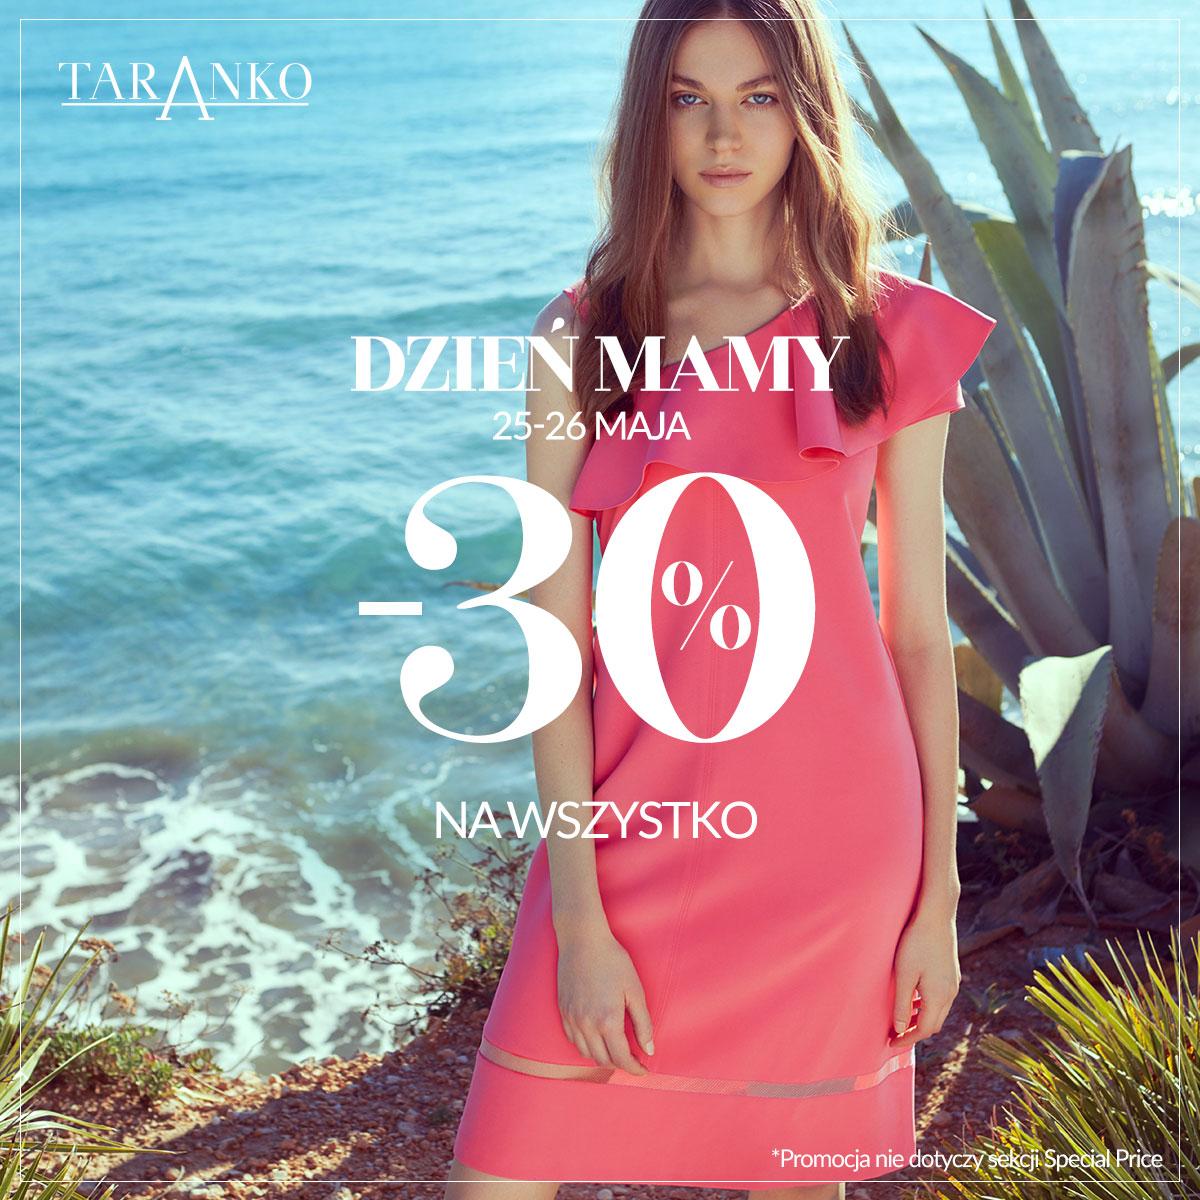 fb242554f5 Promocje Taranko - Sales and Shopping